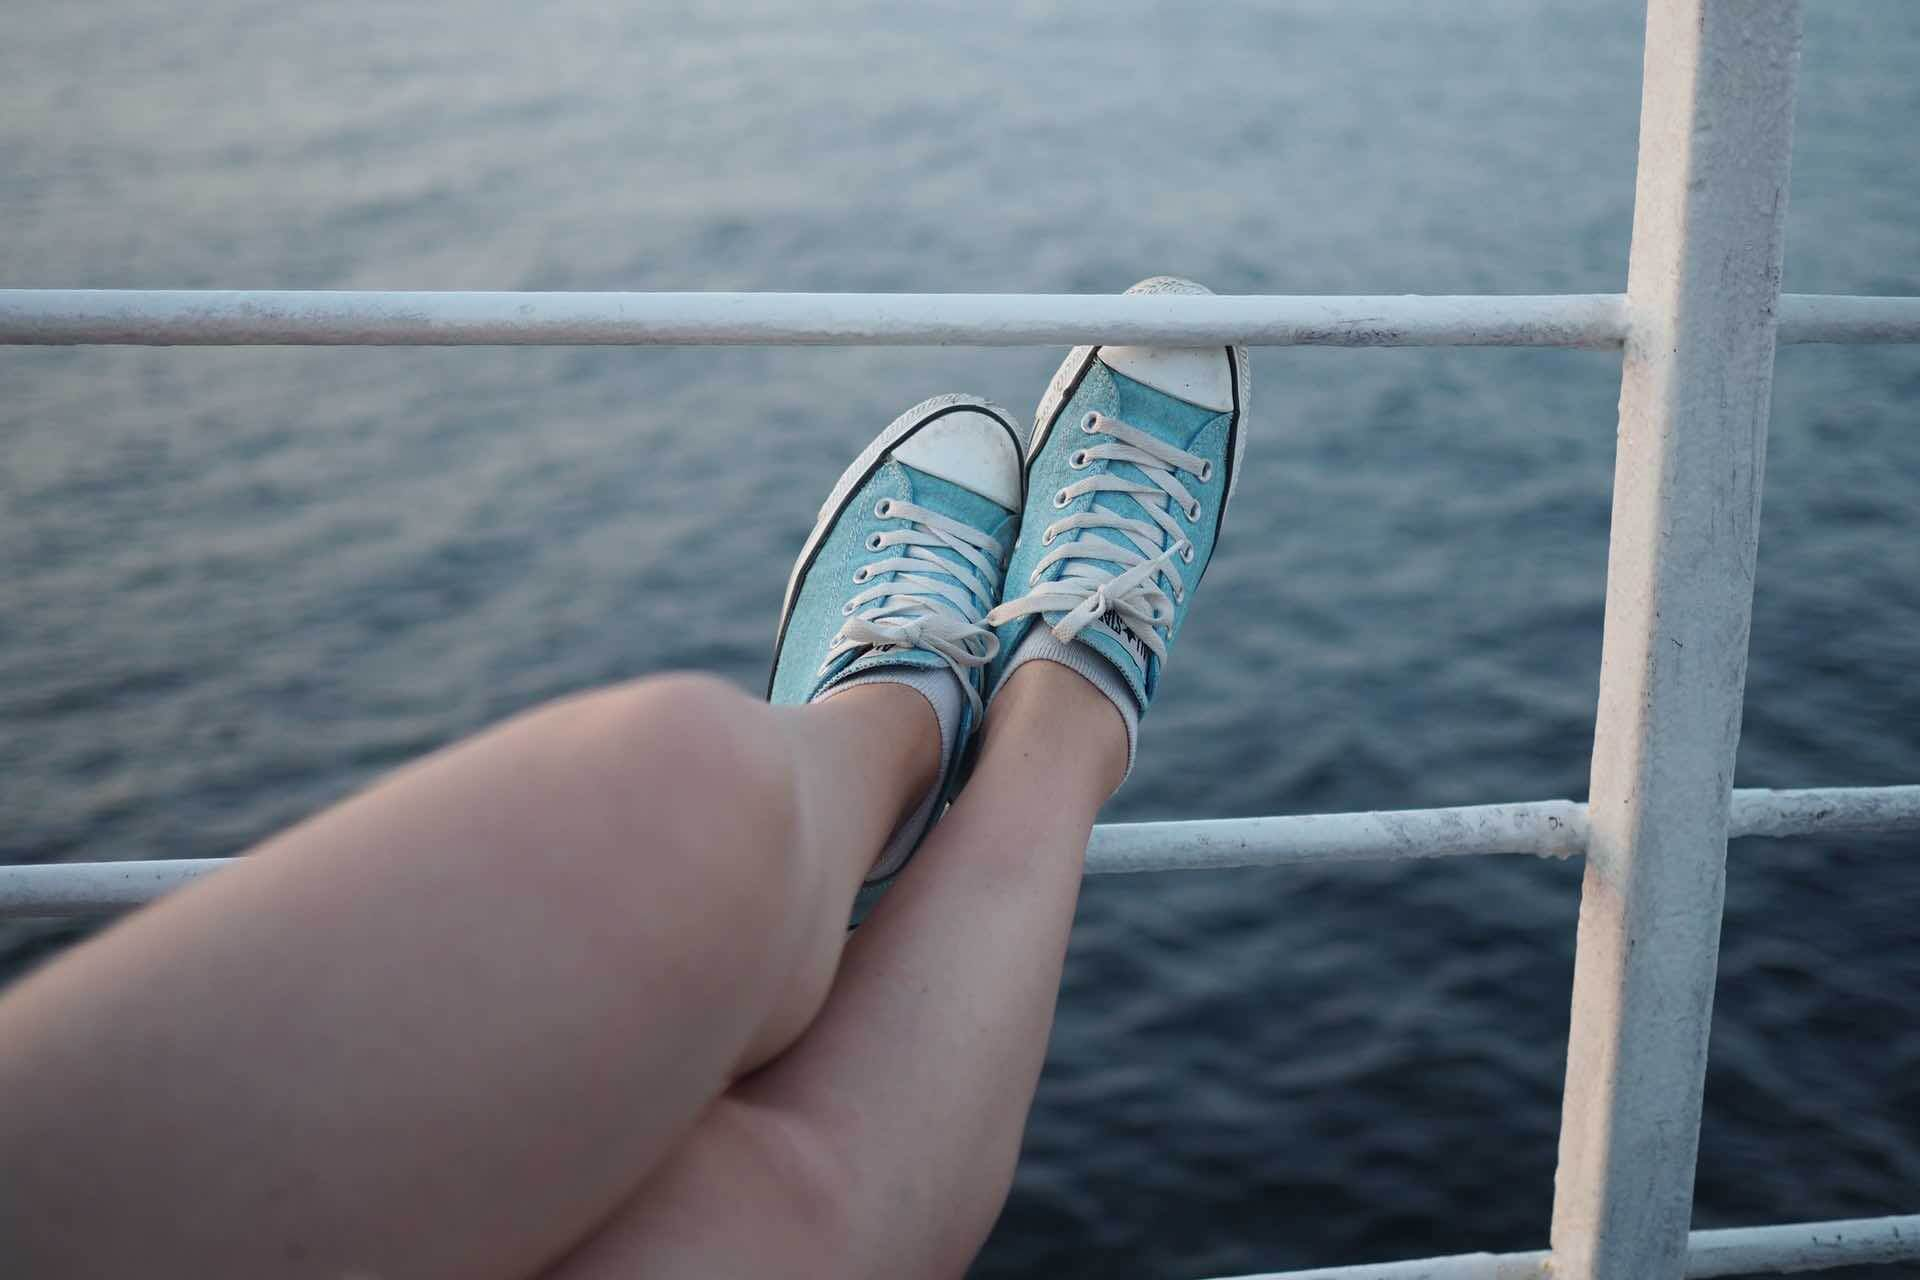 souliers converse bleu jambe mer